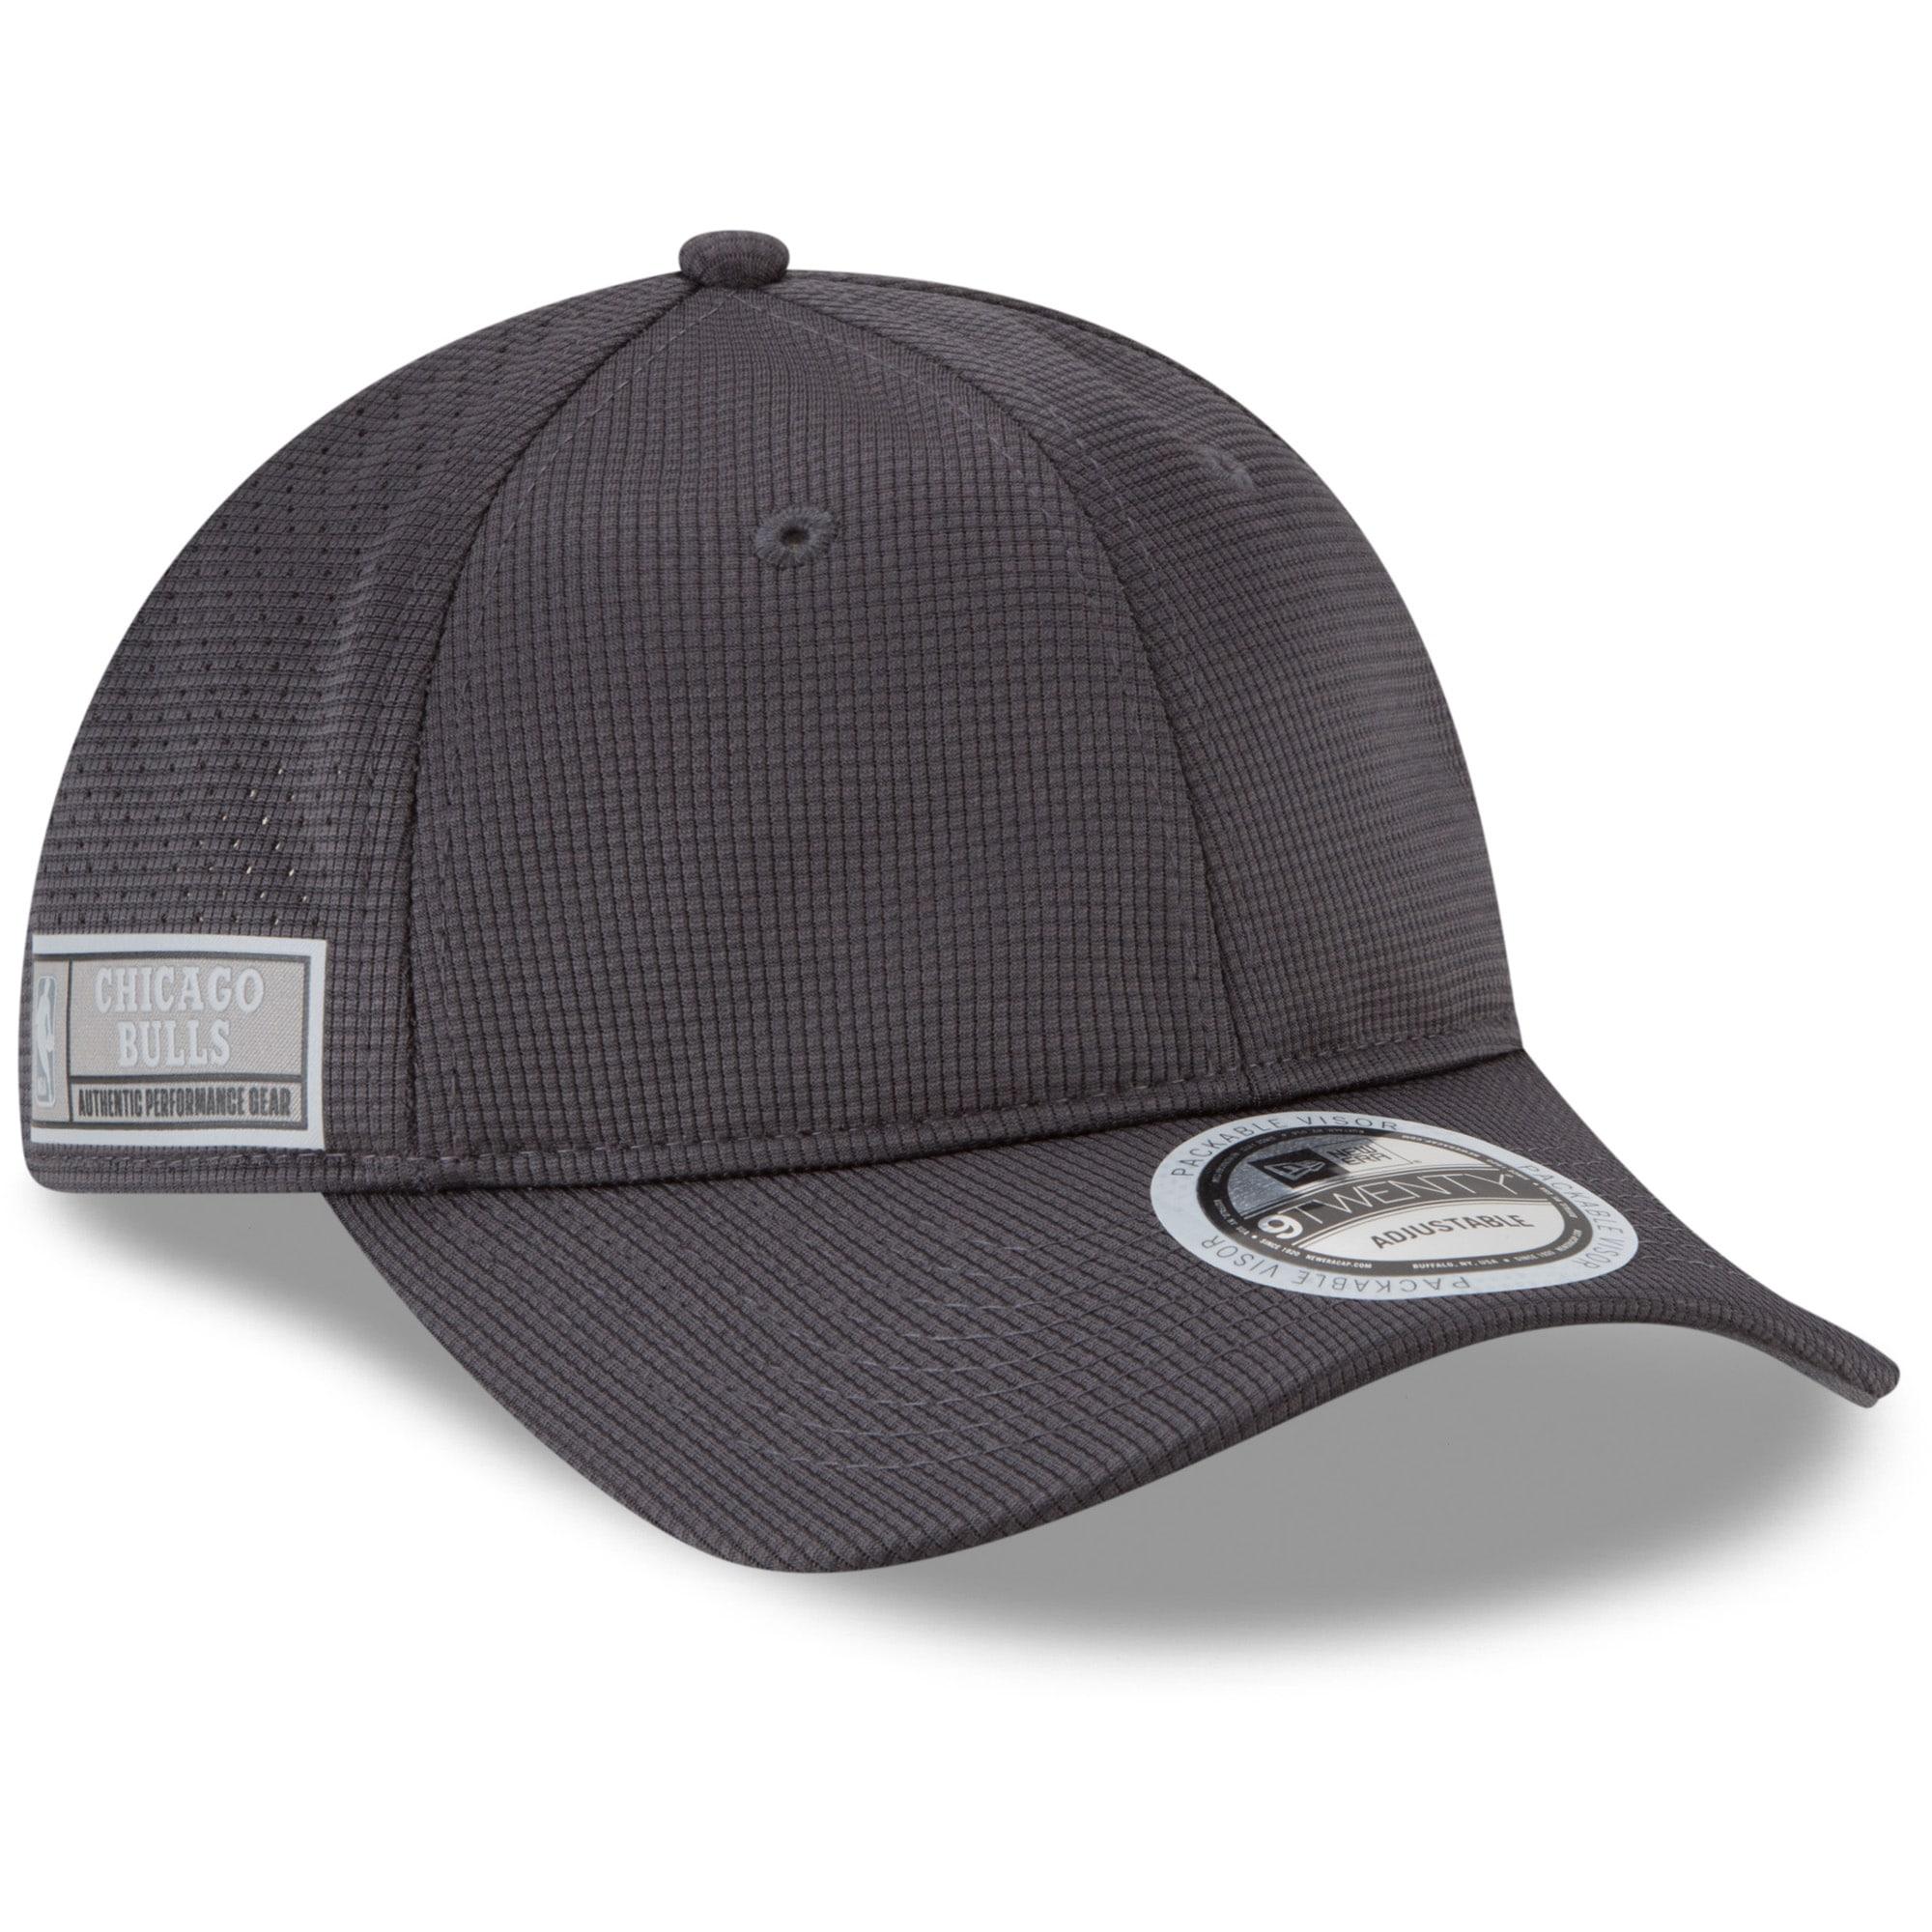 Chicago Bulls New Era Authentics Training 9TWENTY Adjustable Hat - Graphite